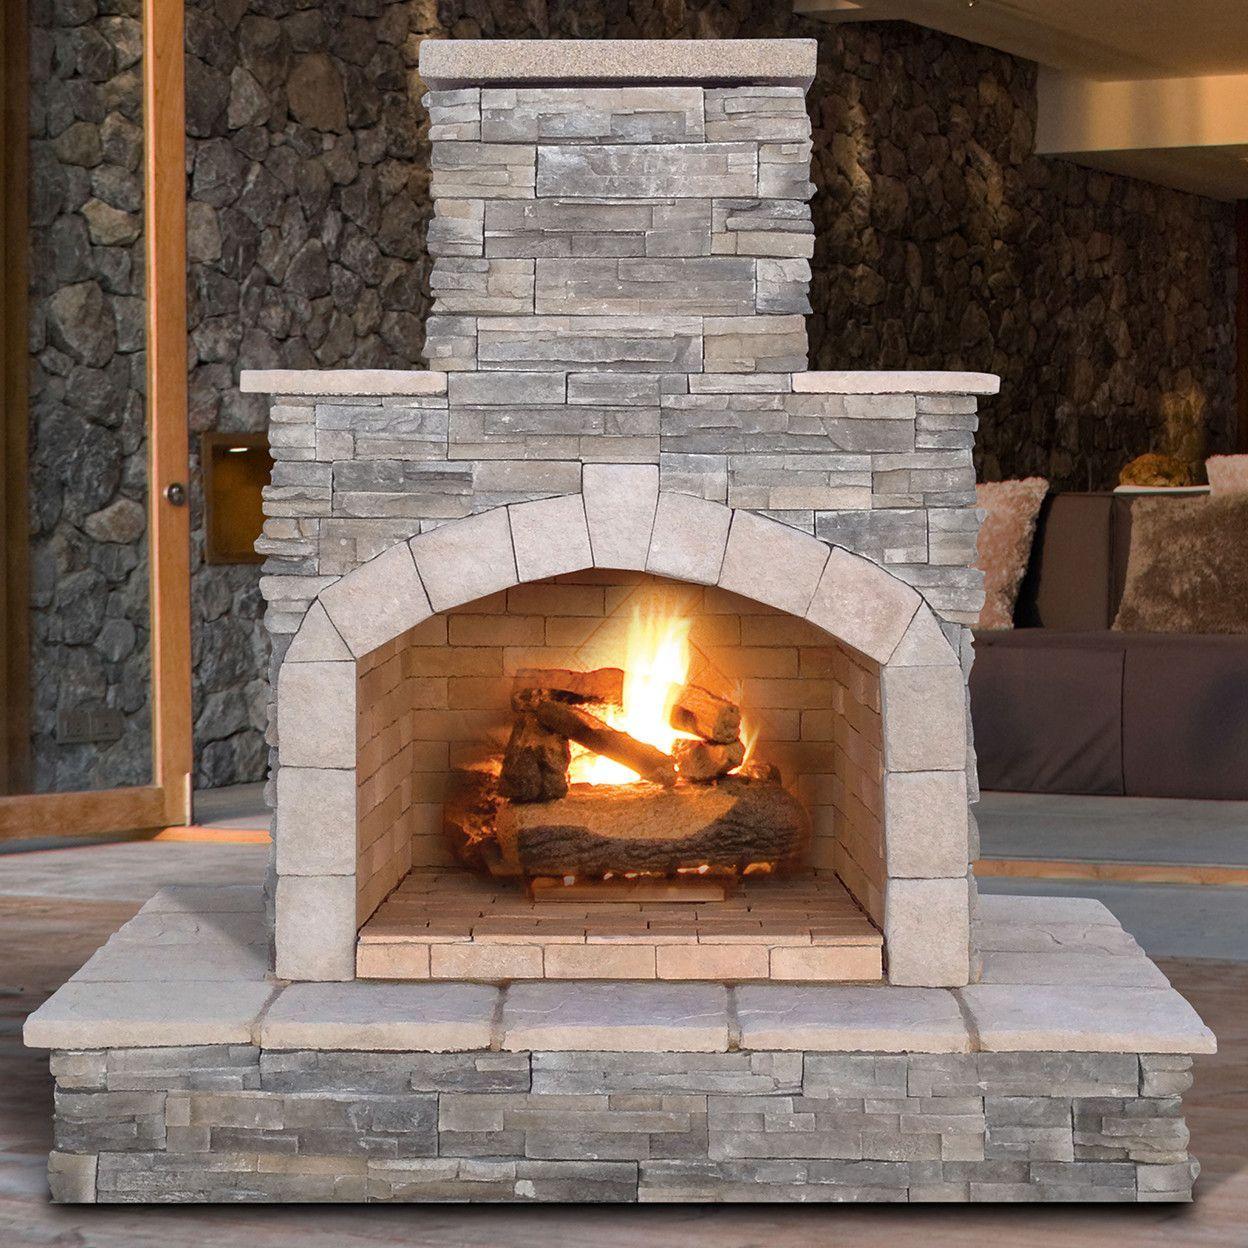 Stone Veneer Propane Natural Gas Outdoor Fireplace Natural Gas Outdoor Fireplace Backyard Fireplace Outdoor Fireplace Designs